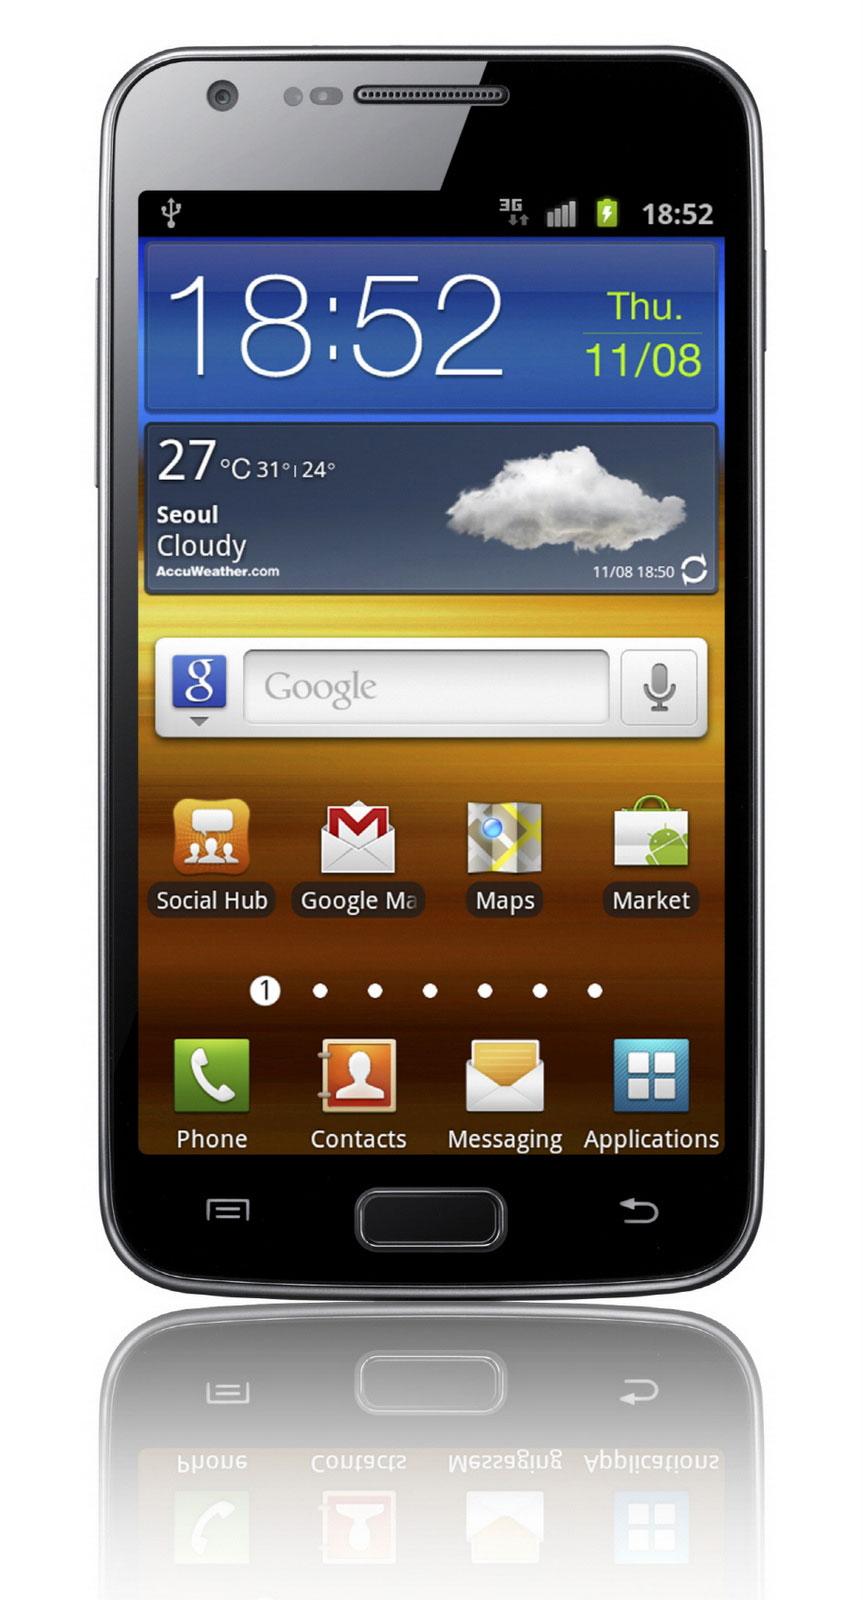 Samsung Galaxy S II HD LTE Image